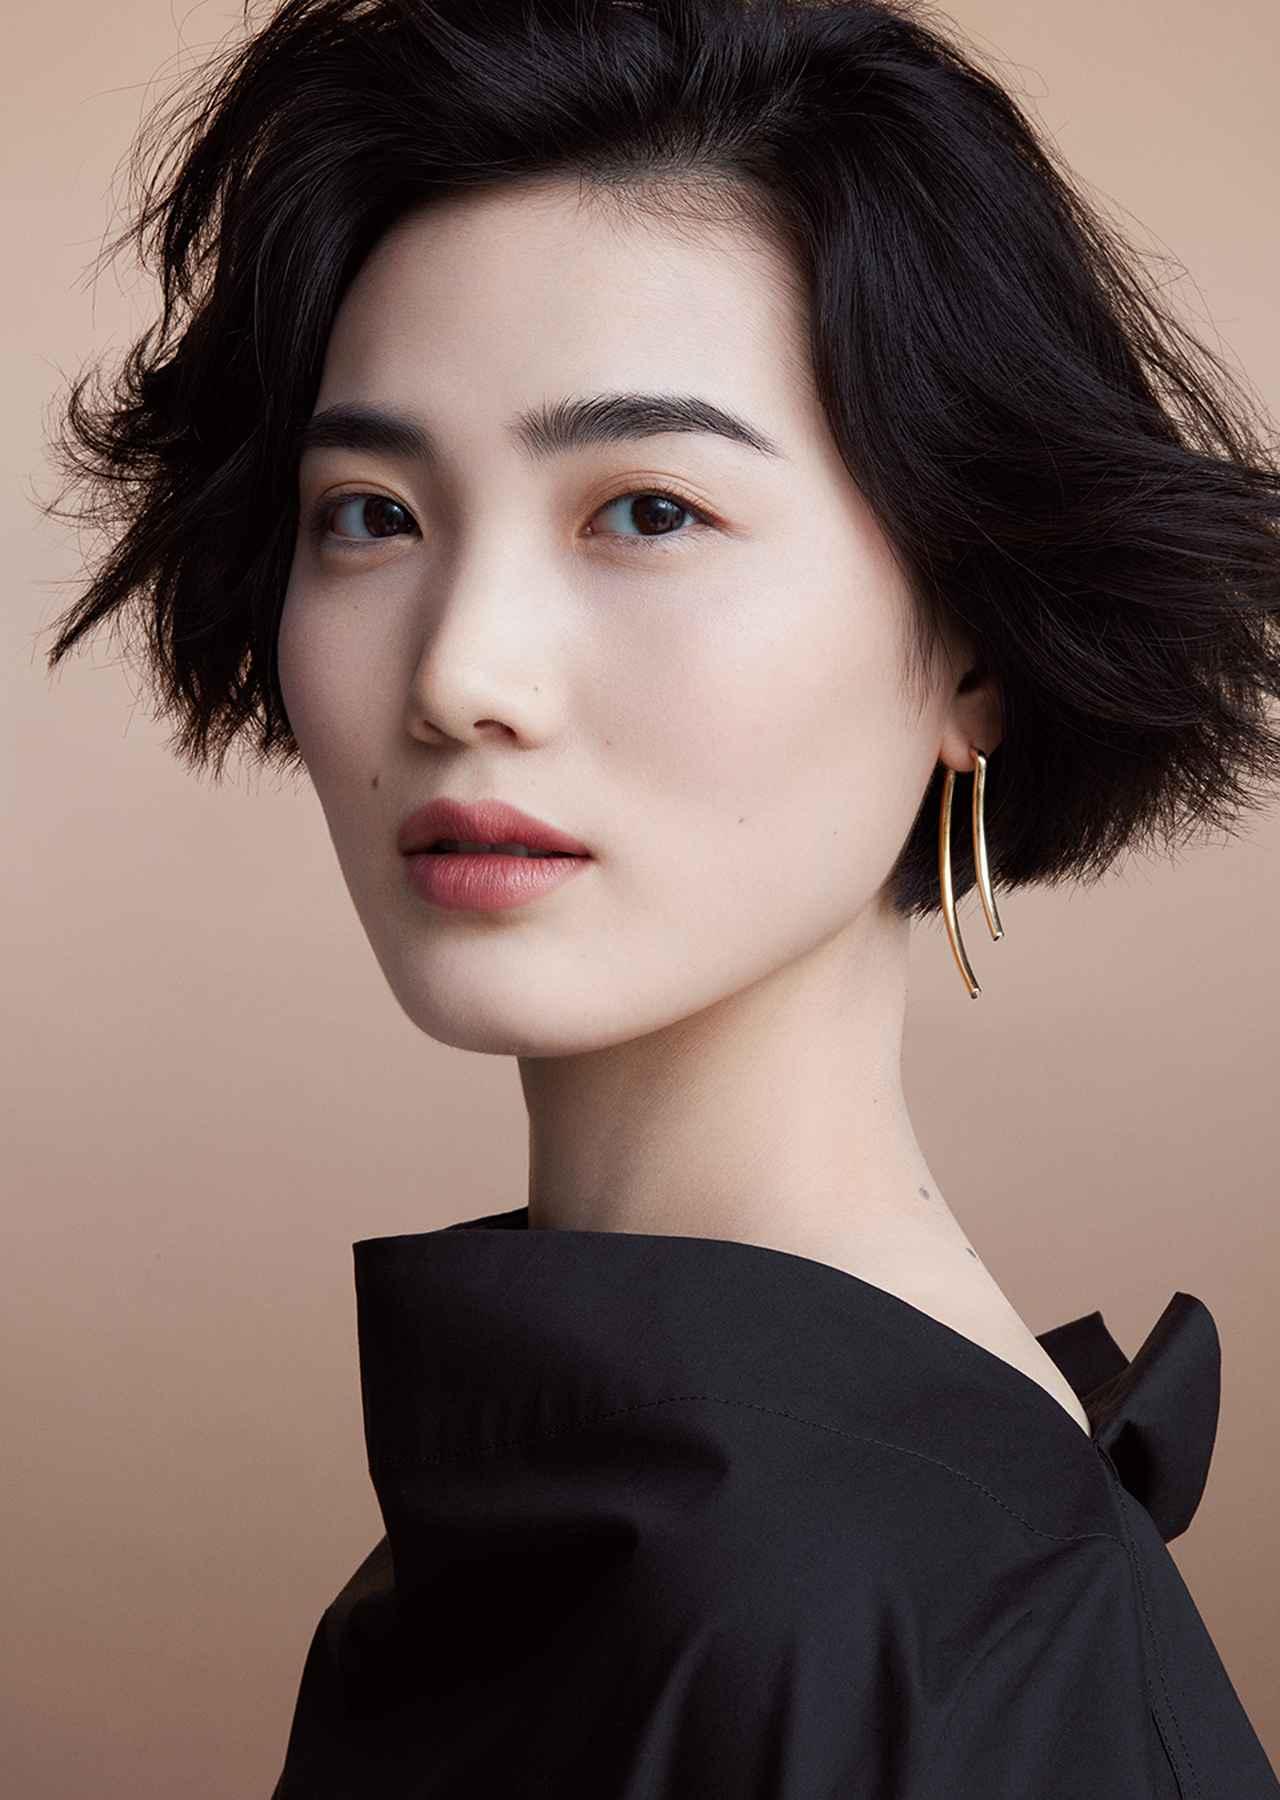 Images : 2番目の画像 - 「RUMIKO、第二章」のアルバム - T JAPAN:The New York Times Style Magazine 公式サイト